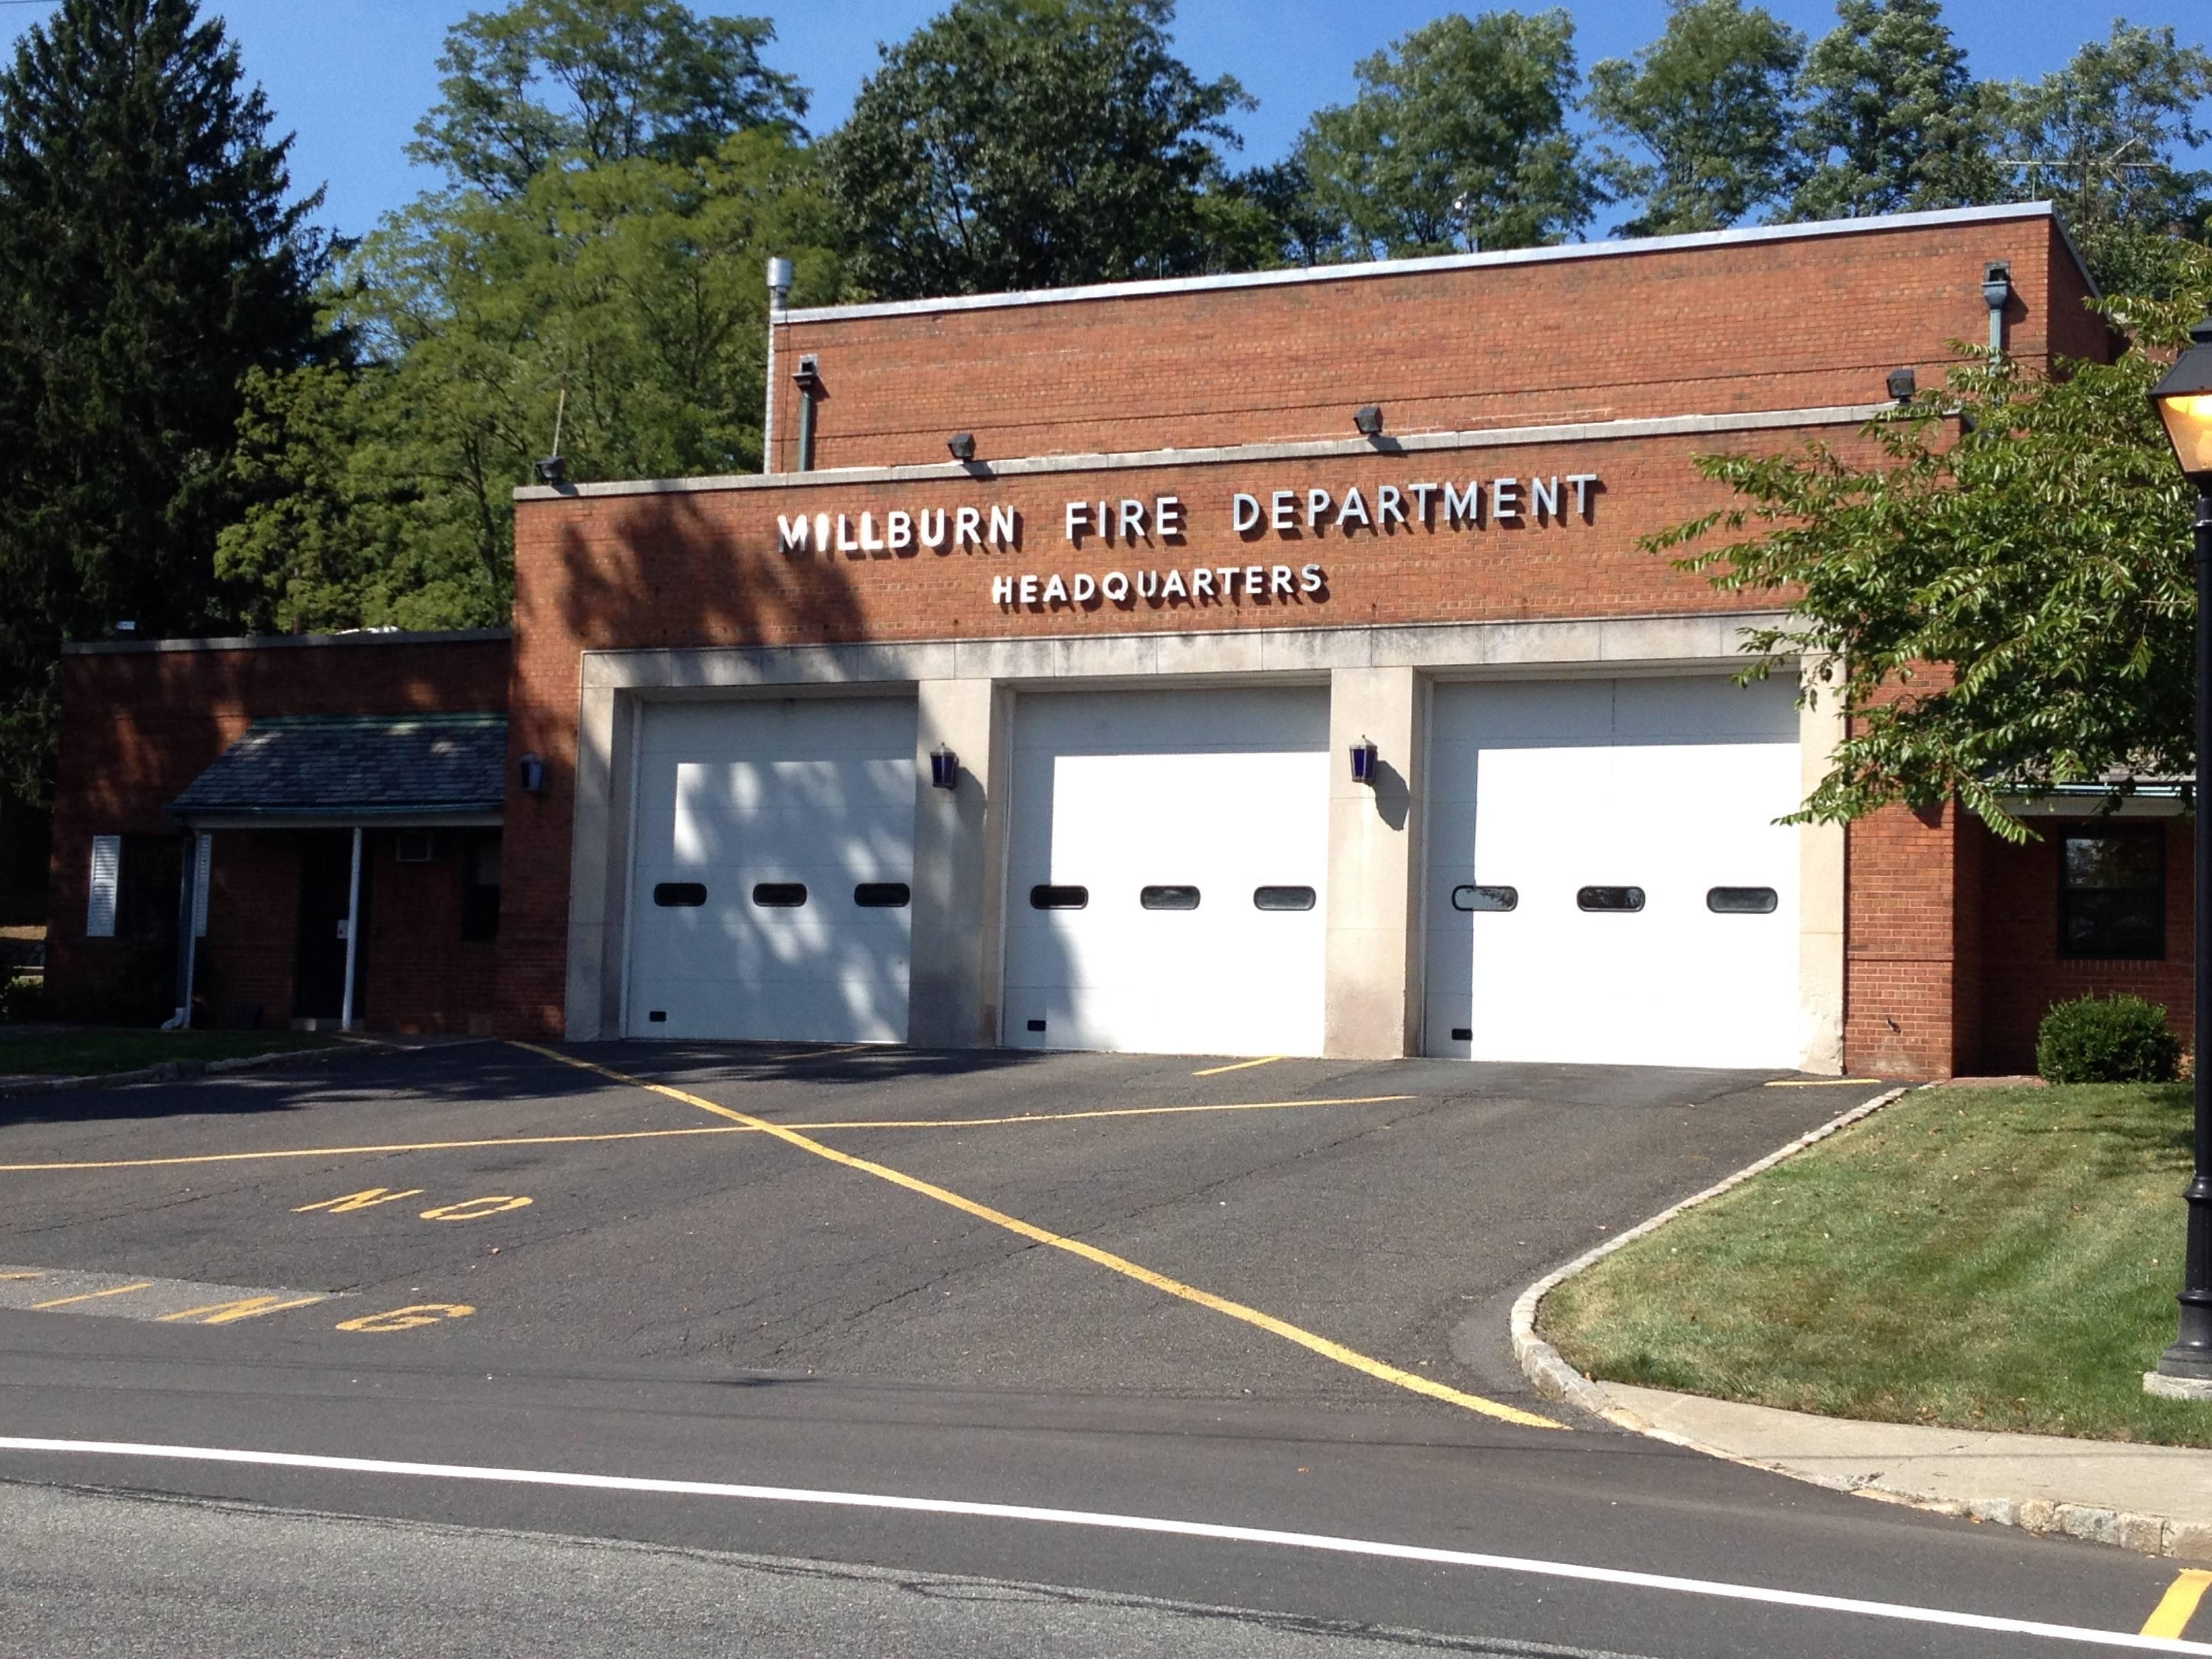 Millburn Fire Department